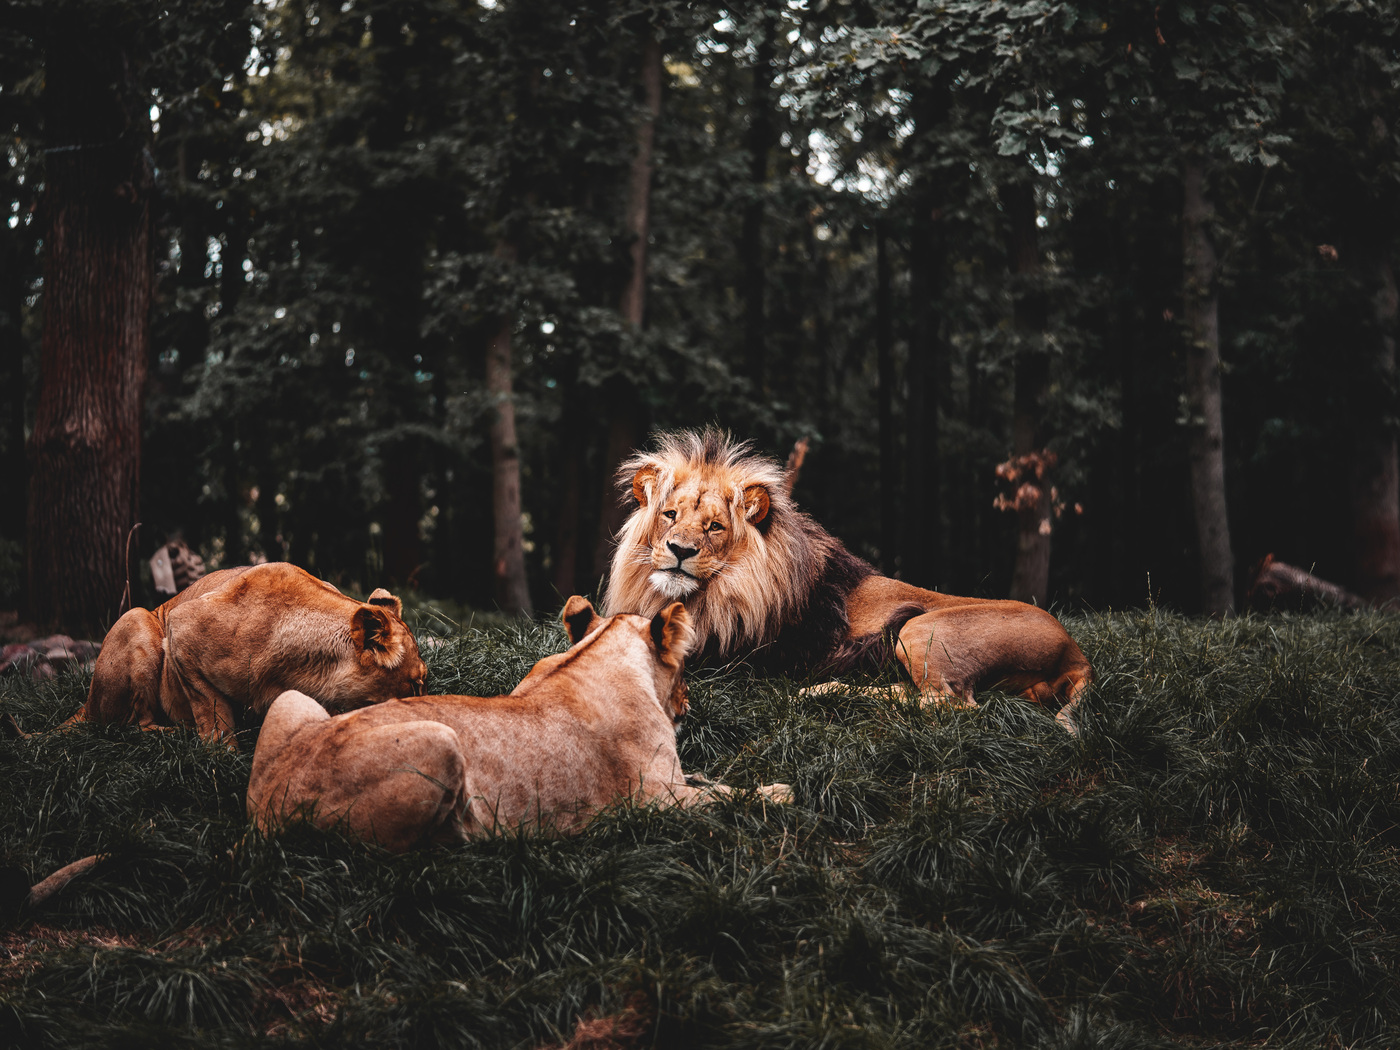 three-lions-lying-down-5k-cw.jpg